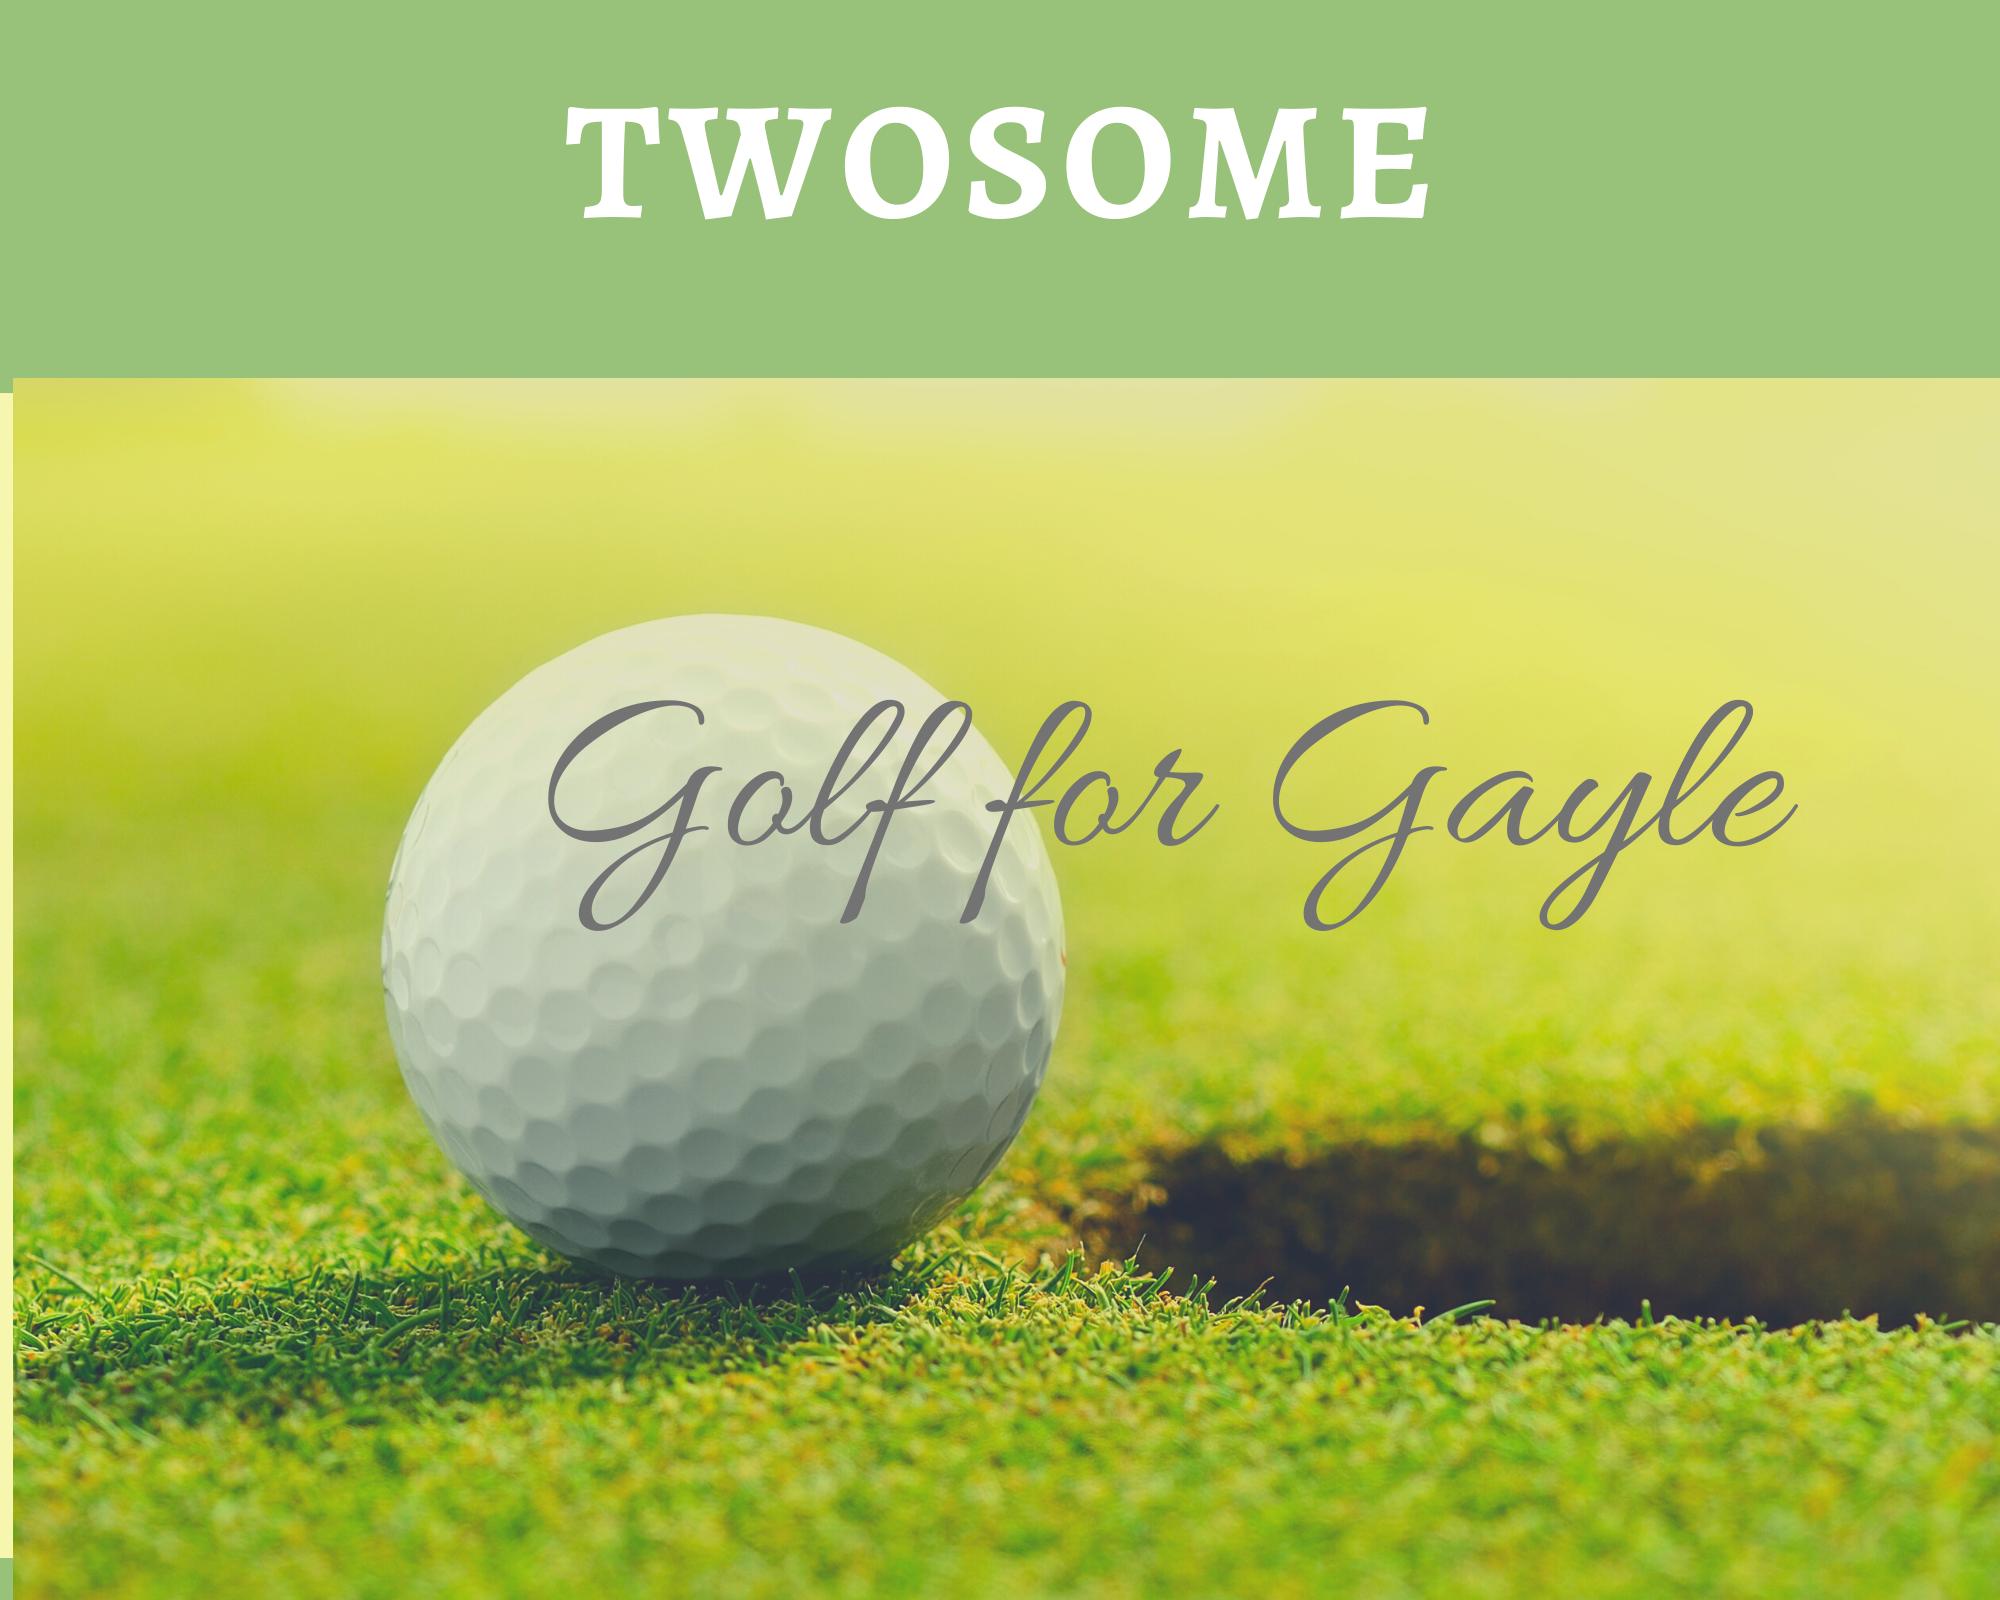 Gayle Newgren Charity Golf Tournament 2021 - Default Image of Twosome